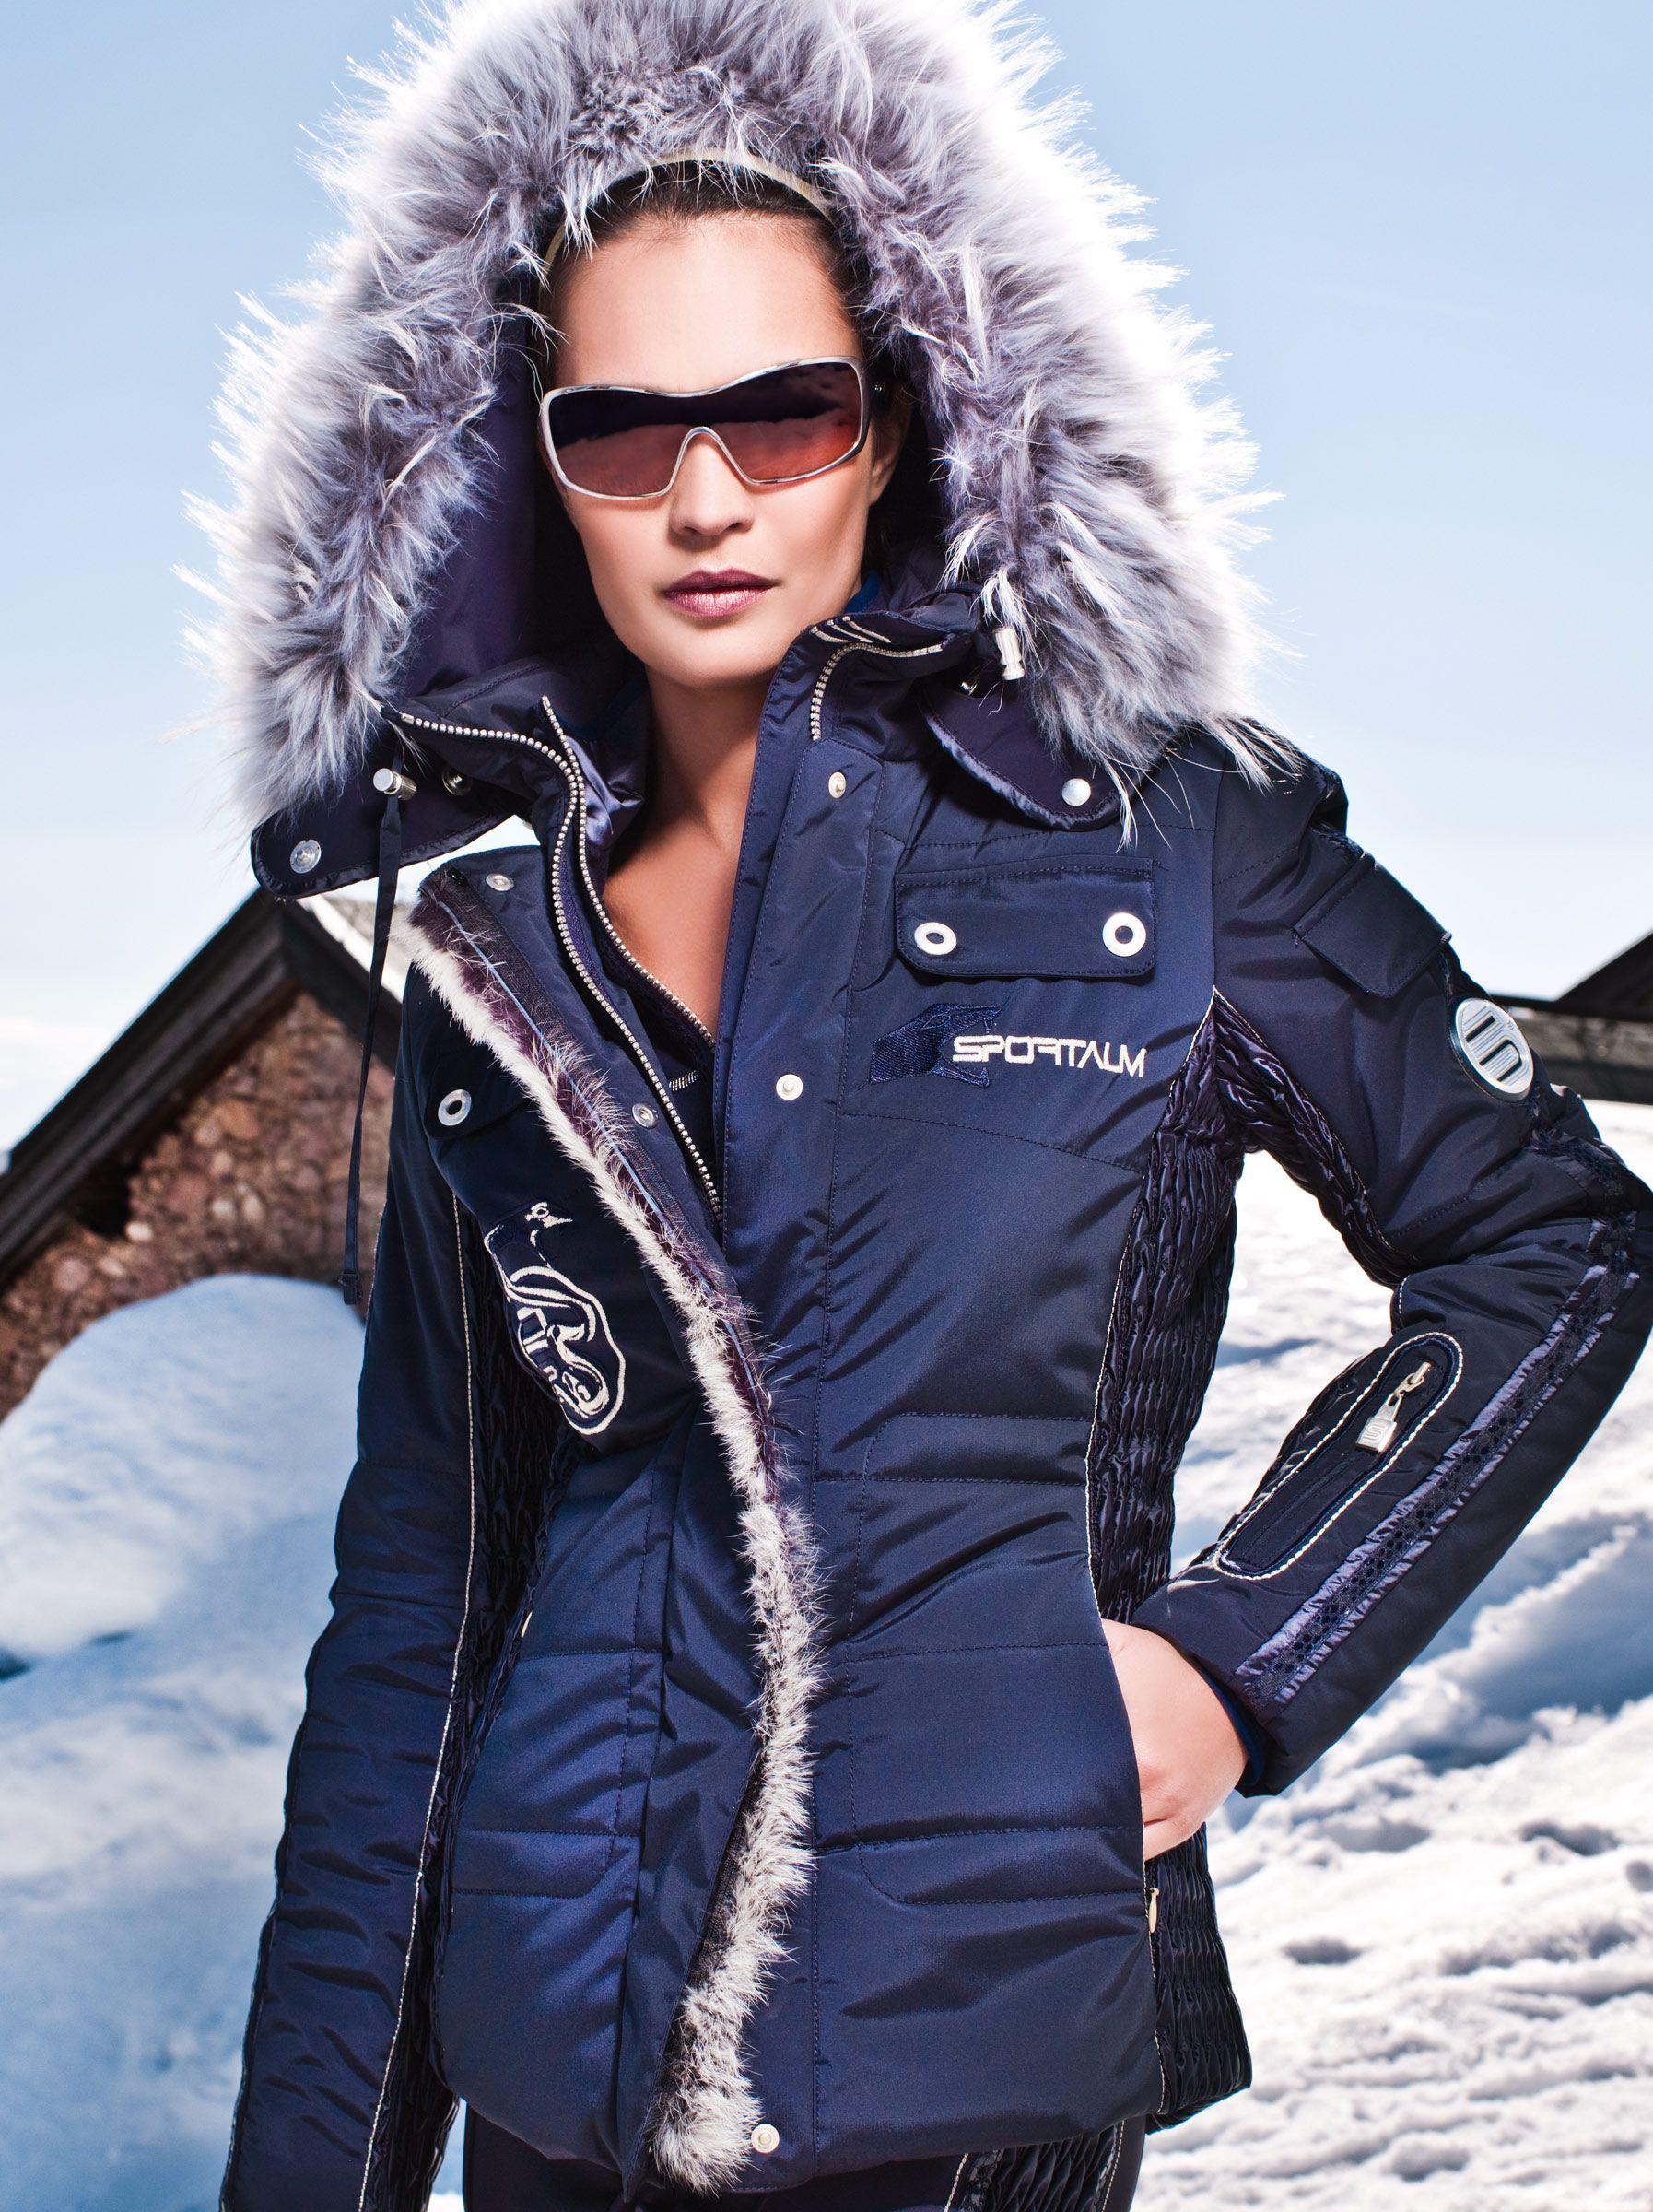 SPORTALM STEEL JACKET Ski Clothing, Ski apparel, Golf